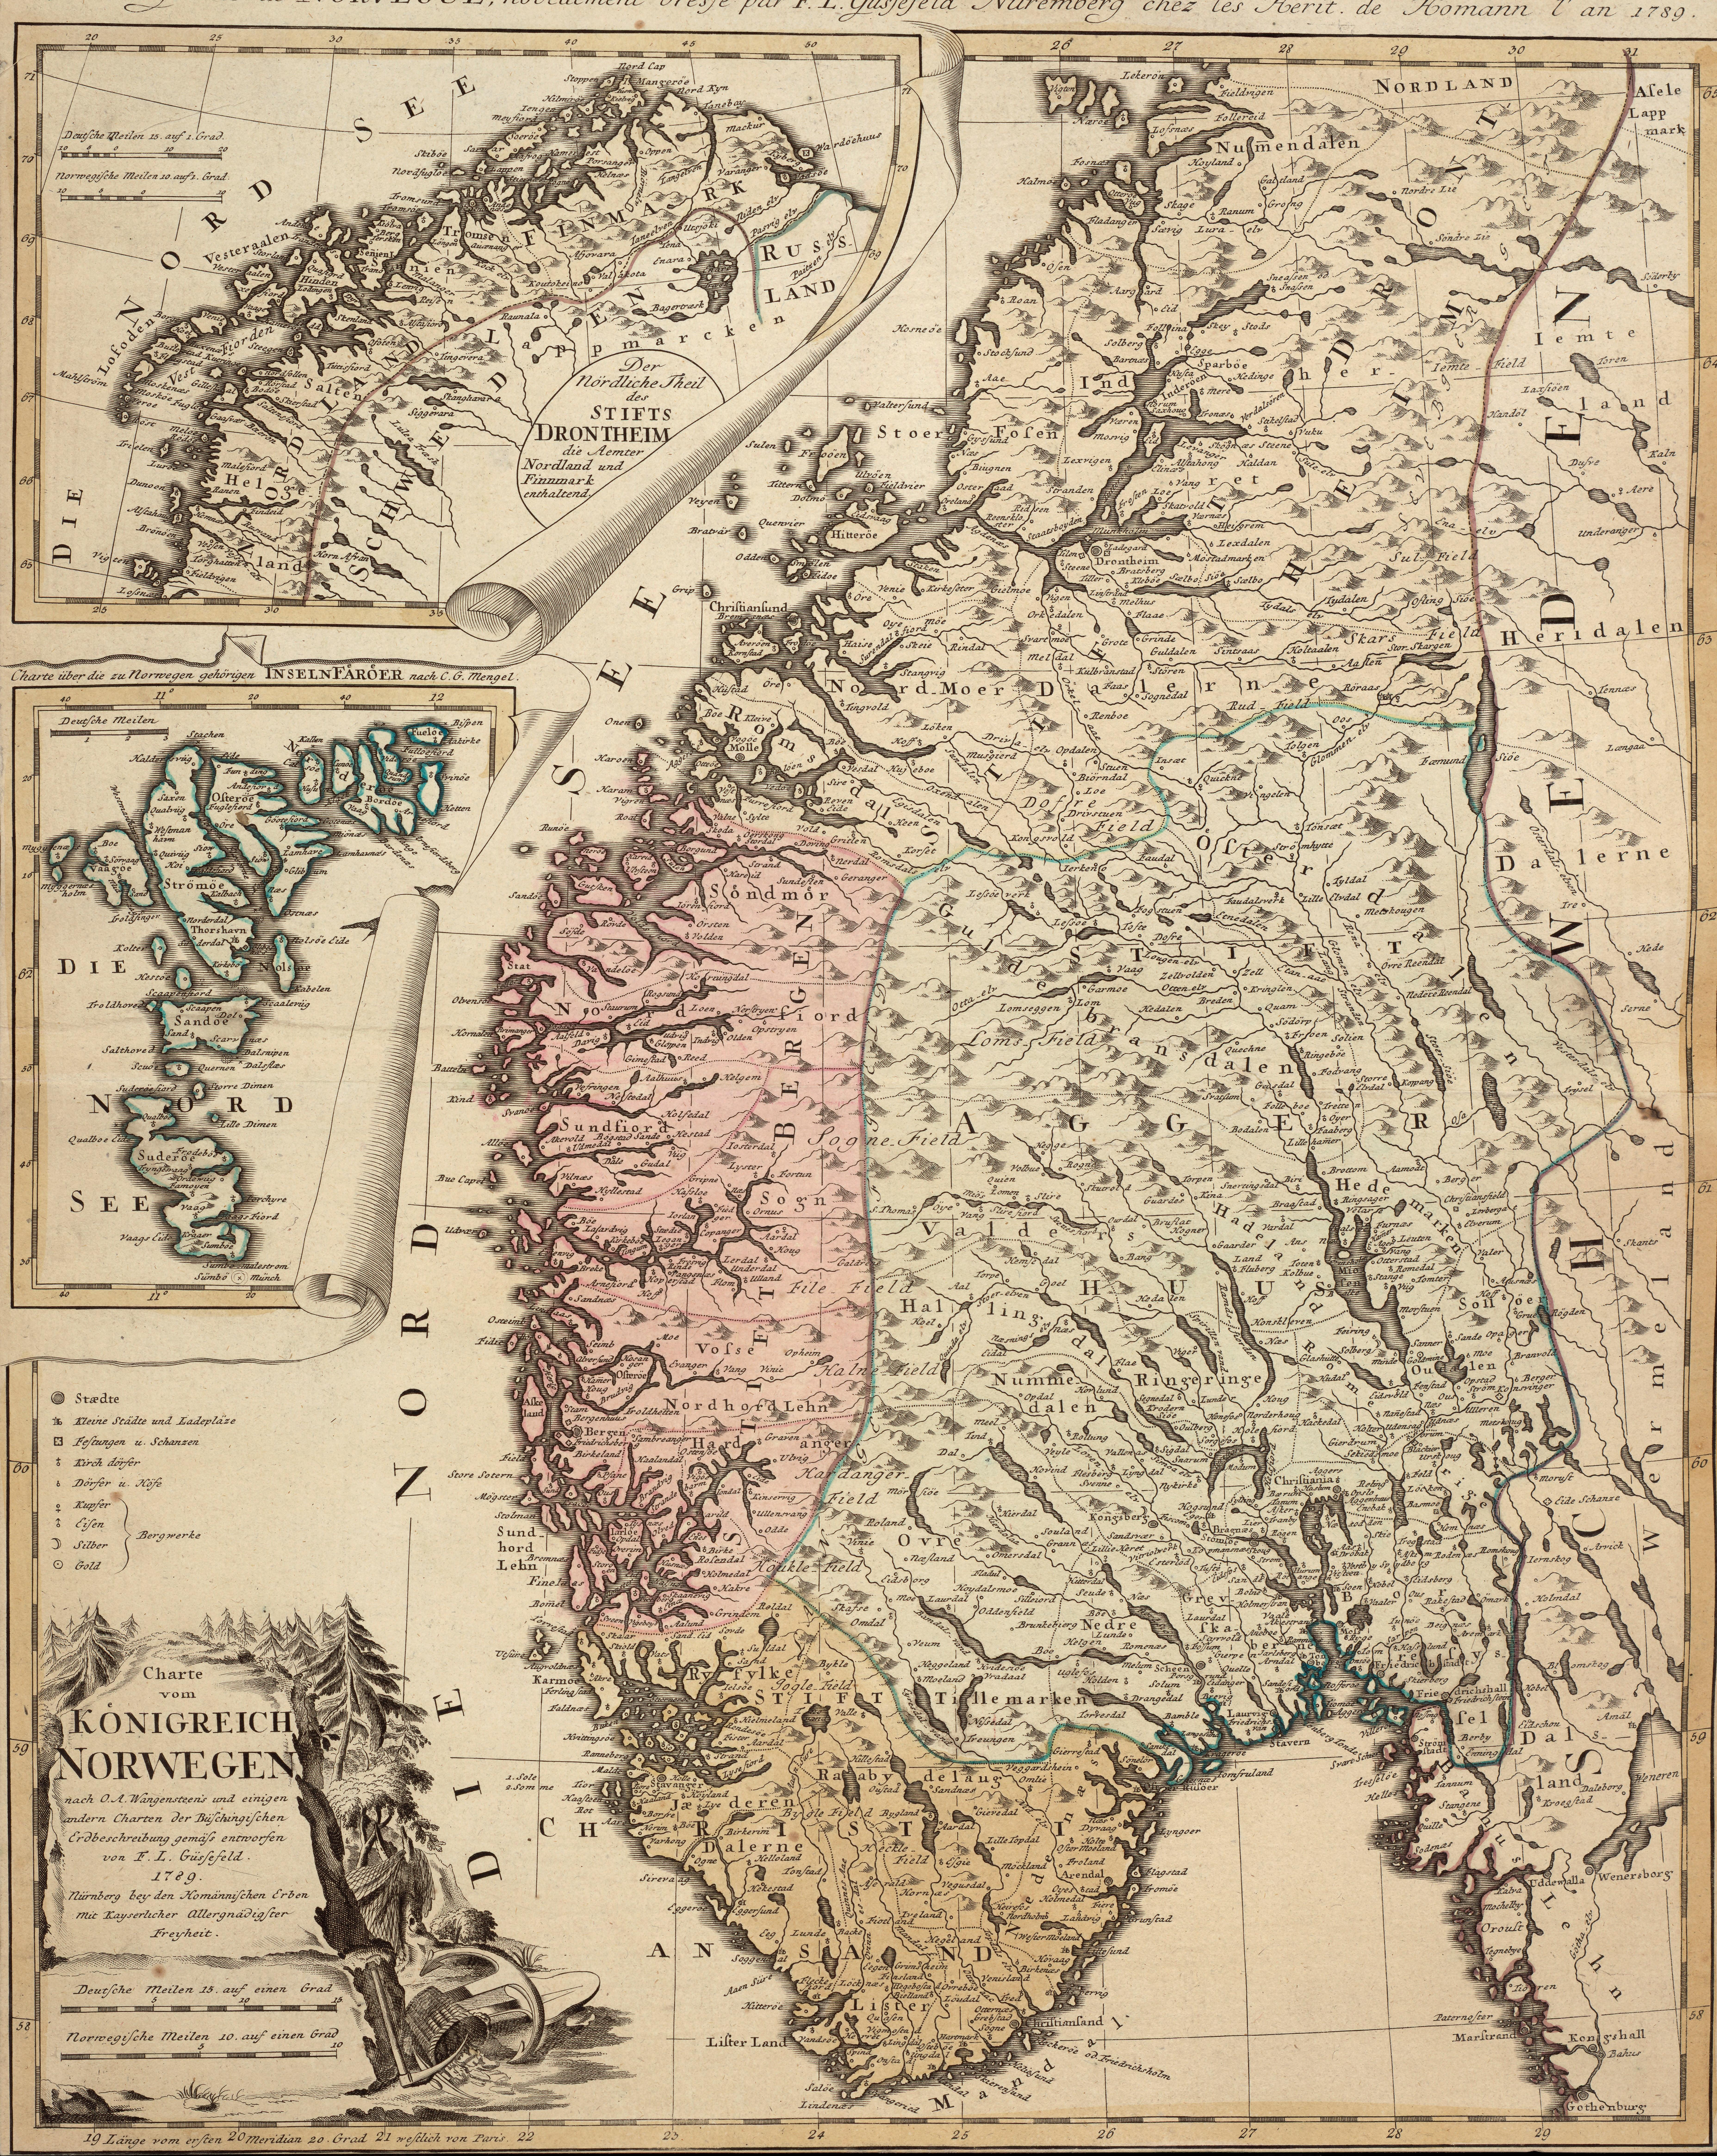 kart norge no File:Gussefeldts kart over Norge   no nb krt 00804.   Wikimedia  kart norge no